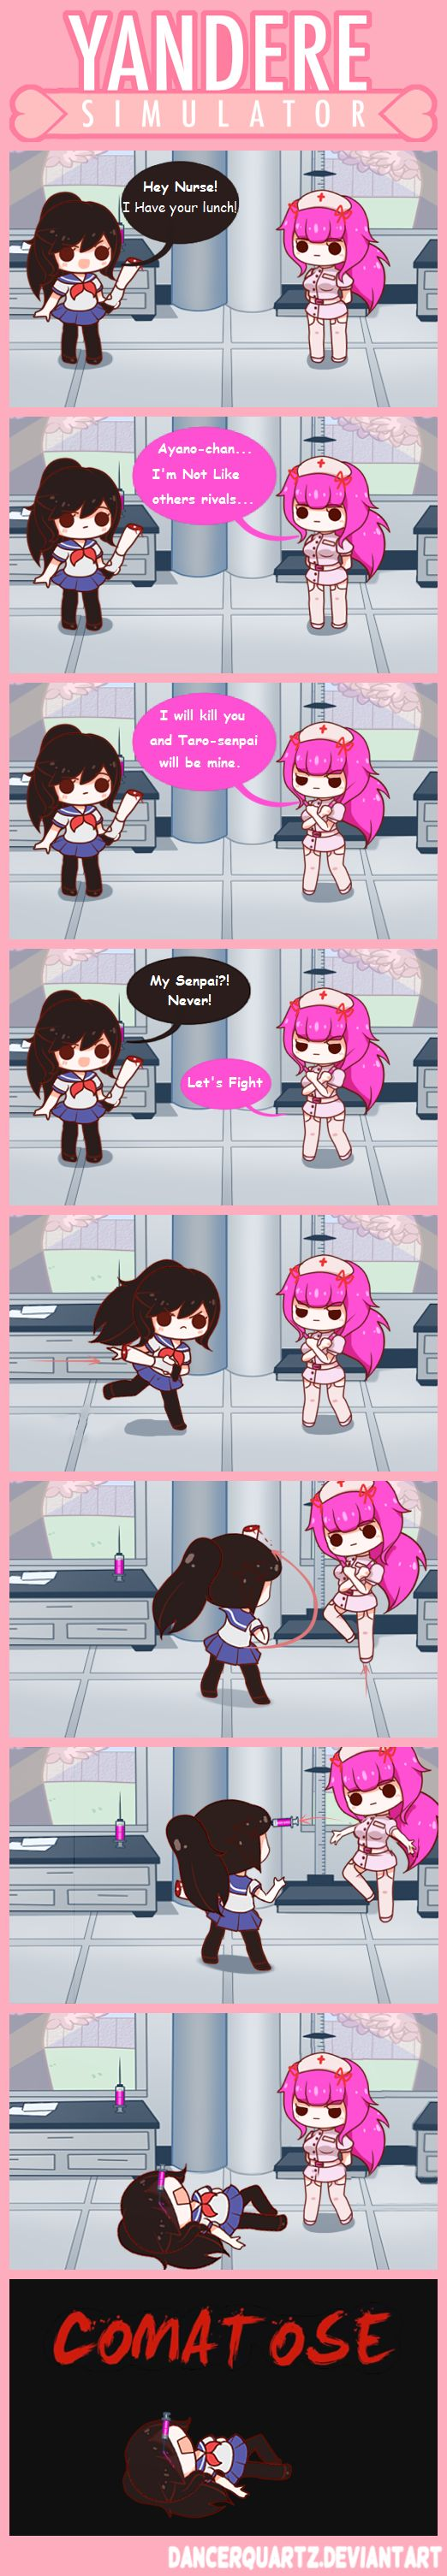 Yandere Comic - Yandere-chan VS The Nurse by DancerQuartz on DeviantArt